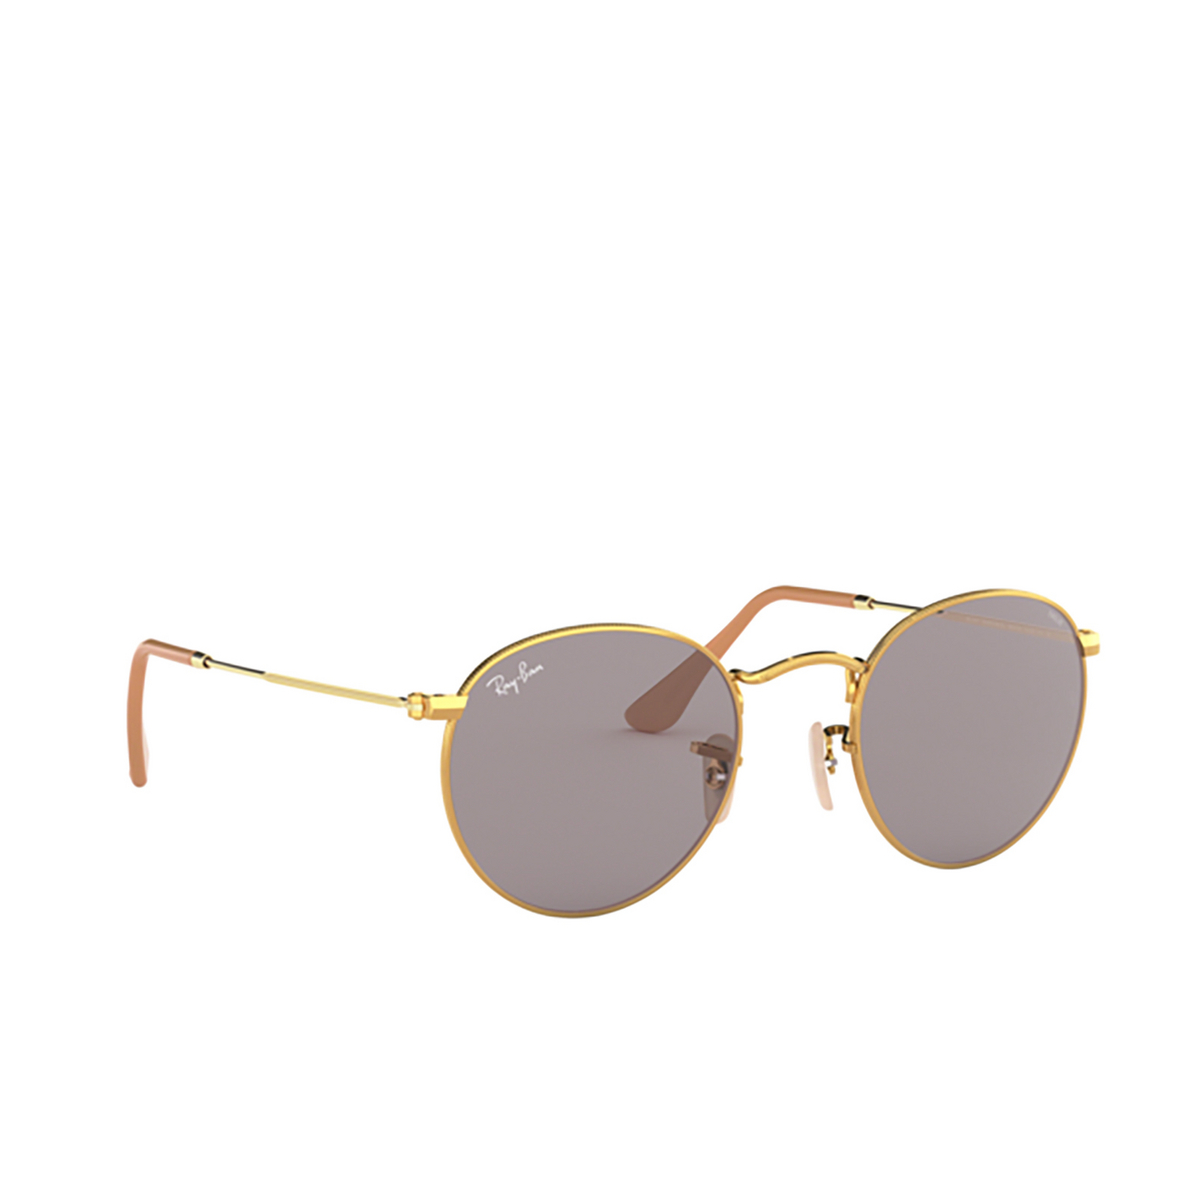 Ray-Ban® Round Sunglasses: Round Metal RB3447 color Arista 9064V8 - three-quarters view.